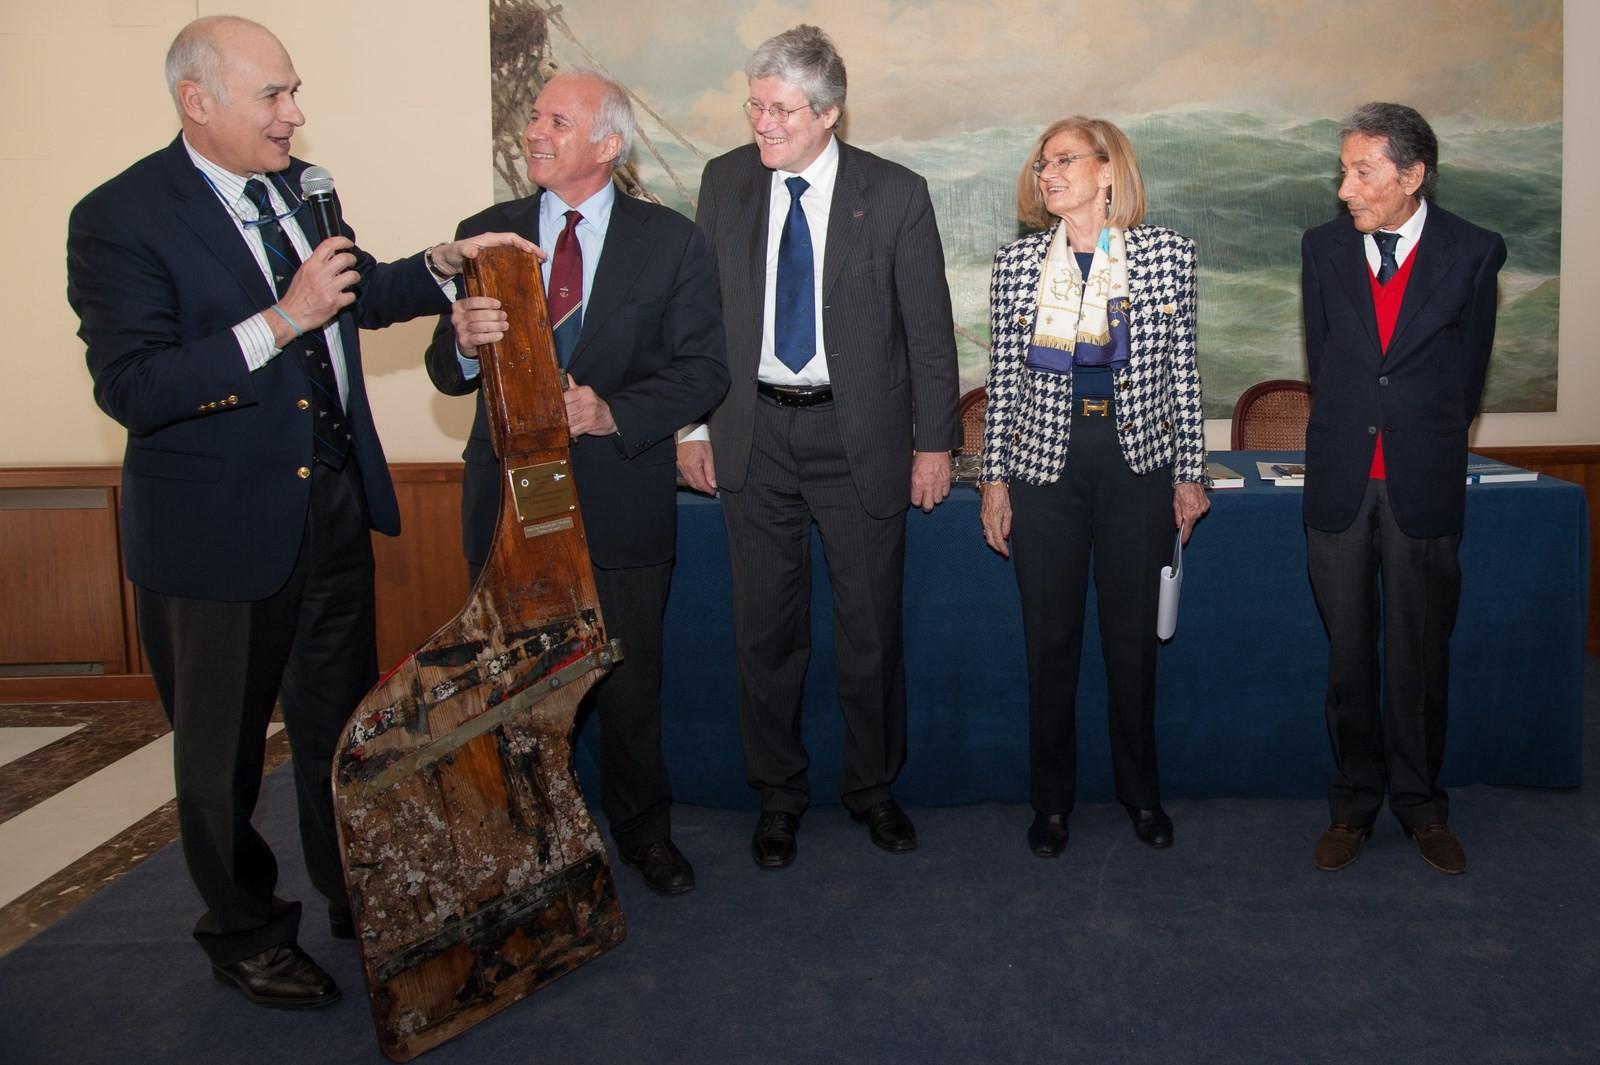 9) Amm. Bembo, C.Corbï, S.Abrami, P. Melani, M.Sonnino